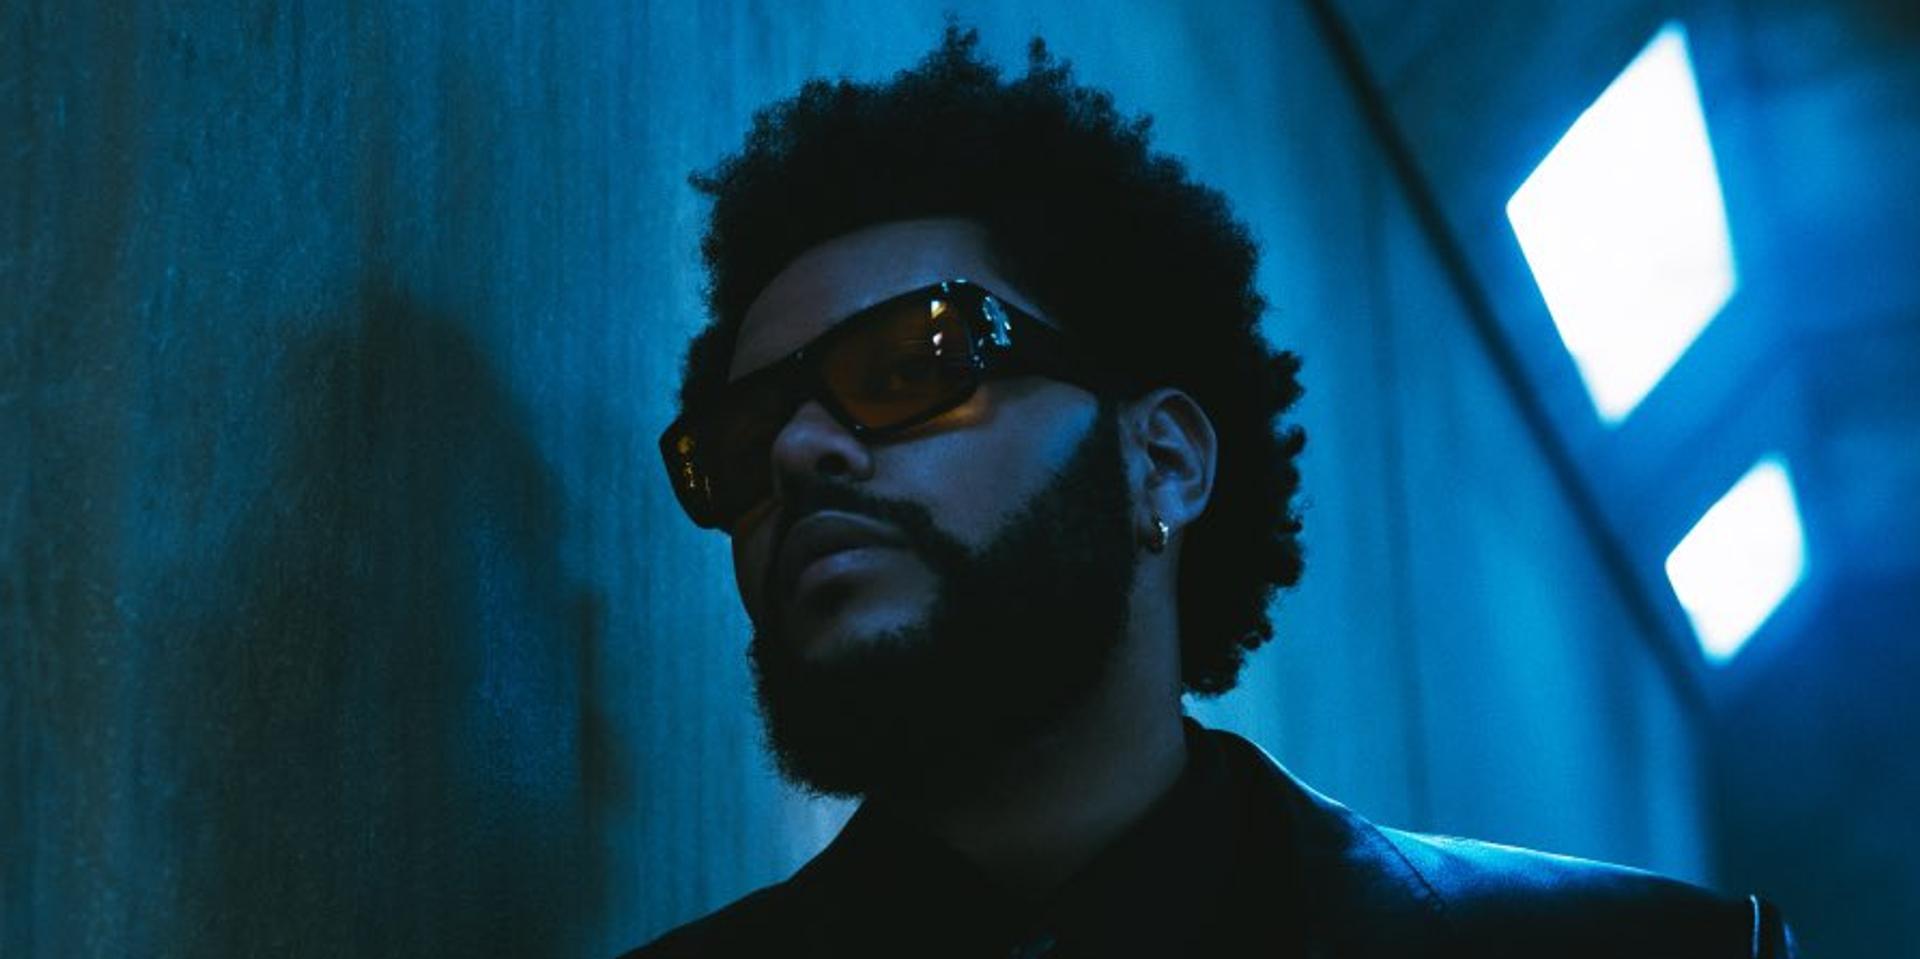 The Weeknd kicks off a new era with brand new single 'Take My Breath' - watch